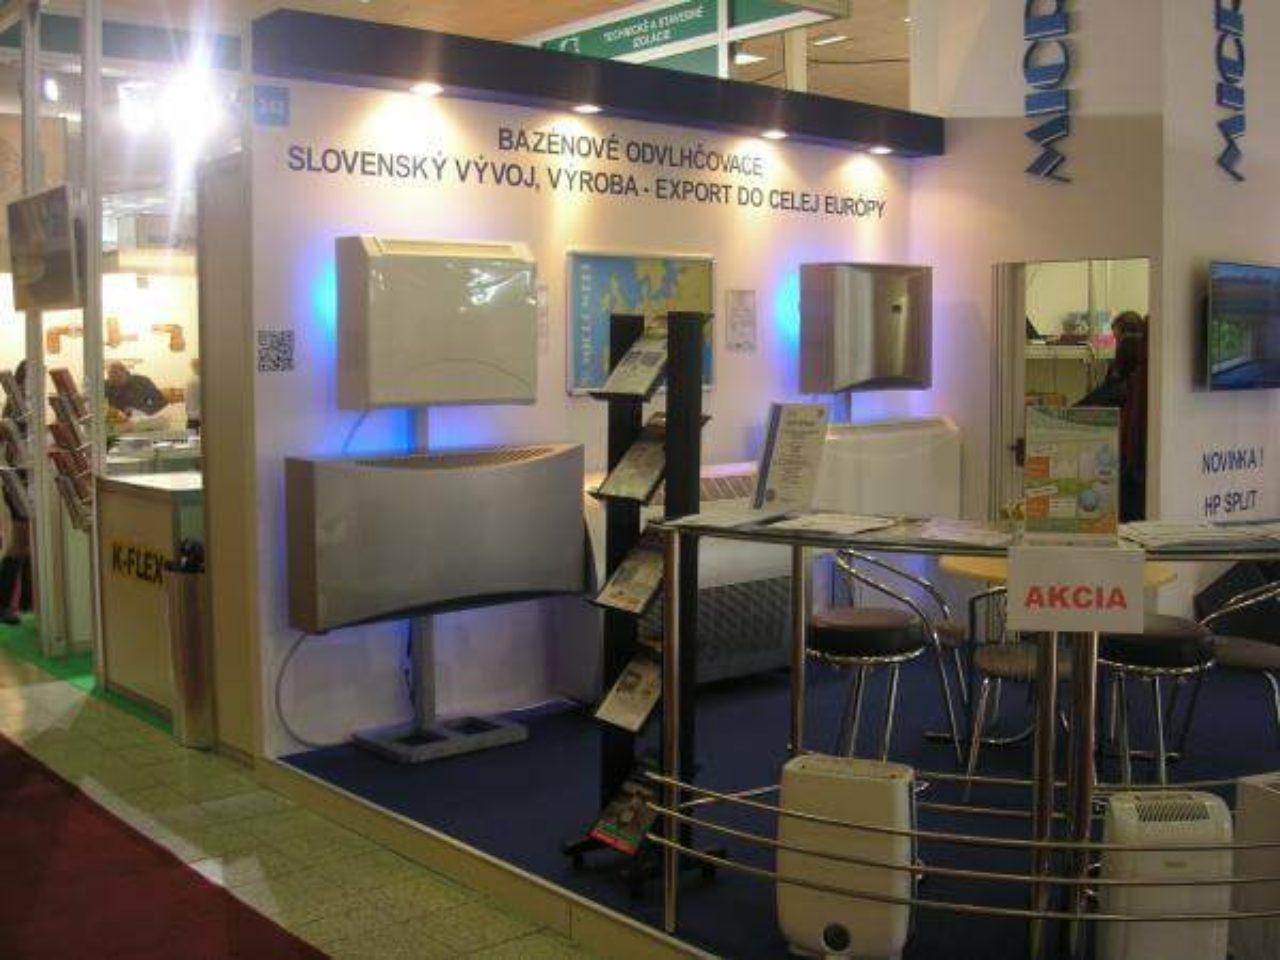 AQUA-THERM 2012 NITRA, SLOVAKIA | Blog - Microwell